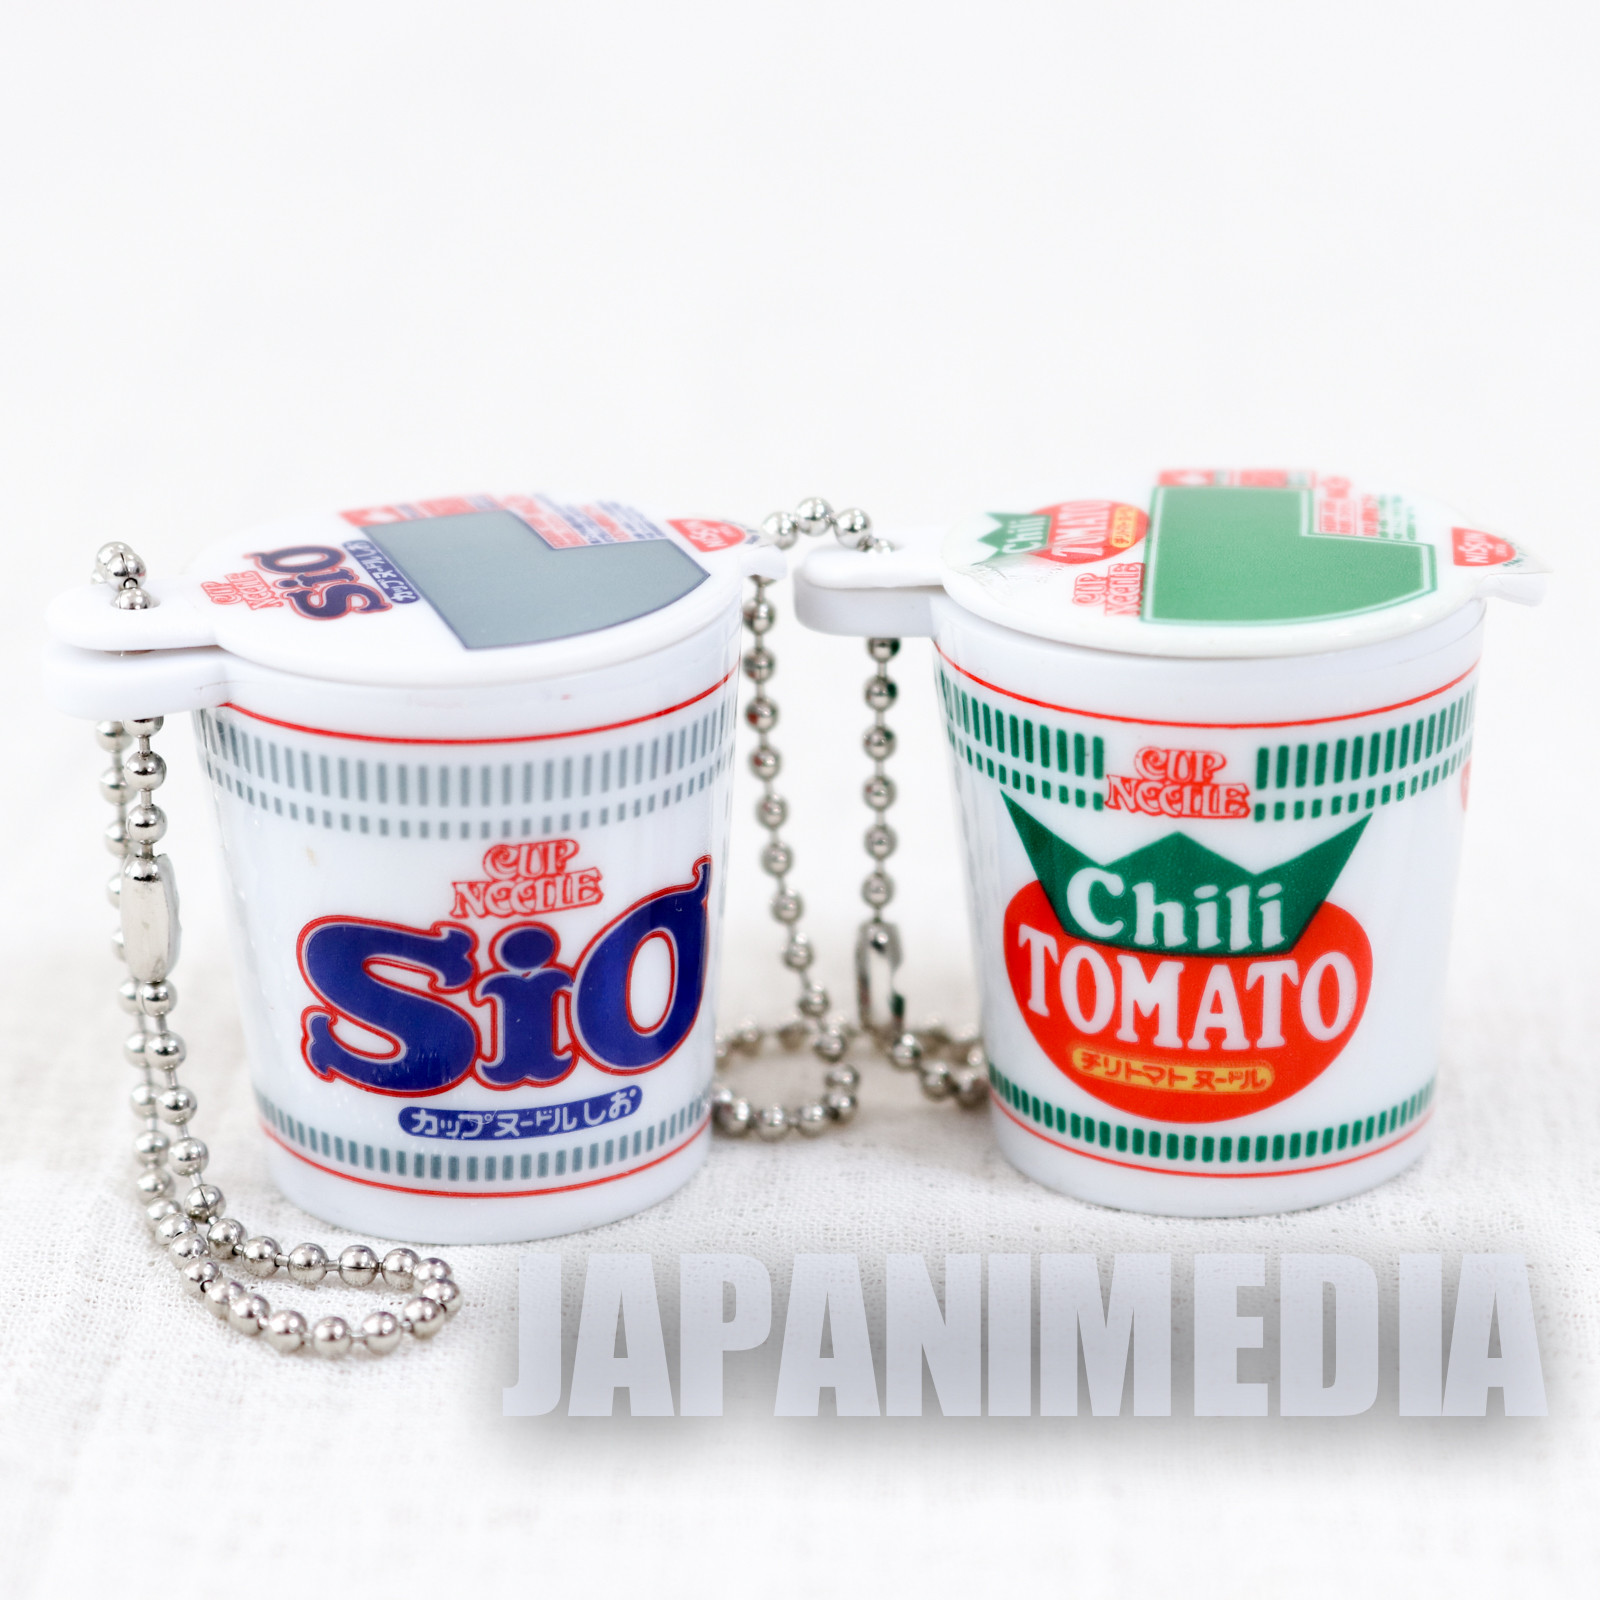 Nissin Cup Noodle Sio & Tomato Miniature Mascot Figure Ballchain JAPAN